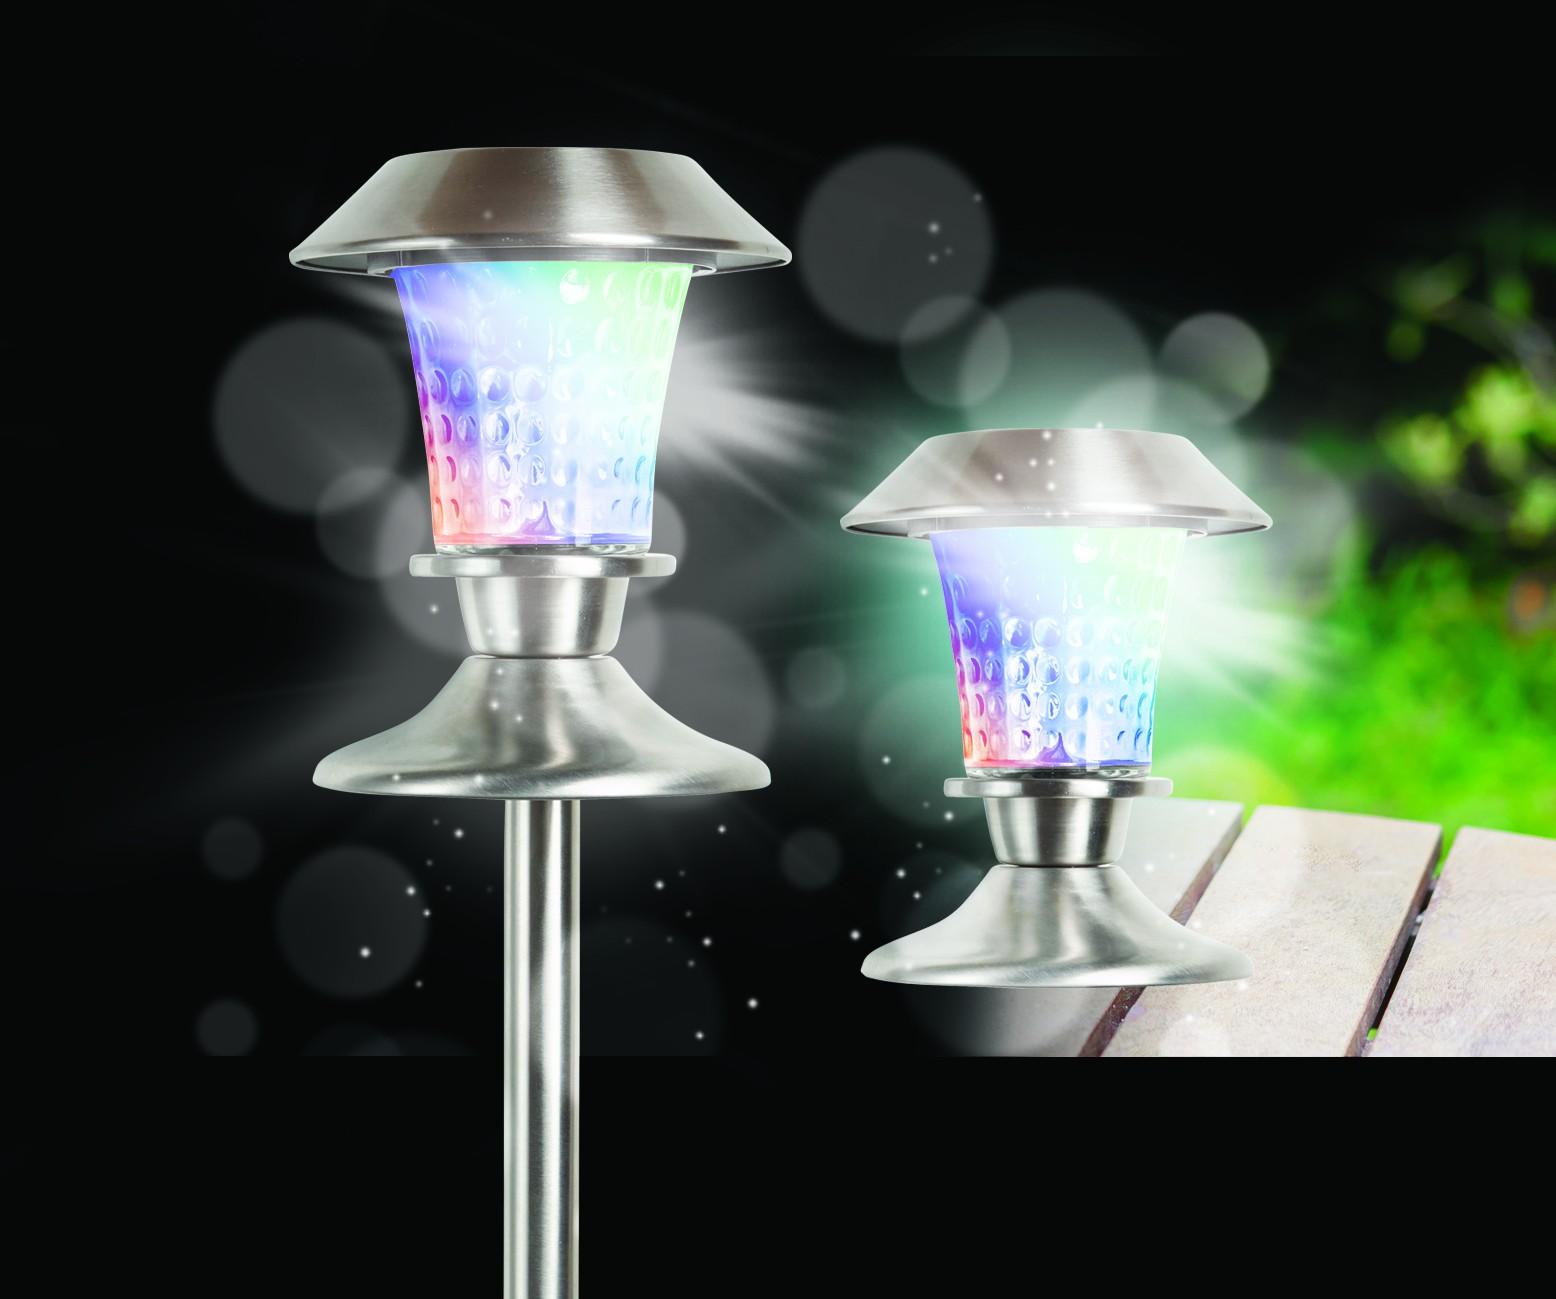 solarleuchte glas solarlampe edelstahl farbwechsel rotation effekt wegeleuchte garten. Black Bedroom Furniture Sets. Home Design Ideas